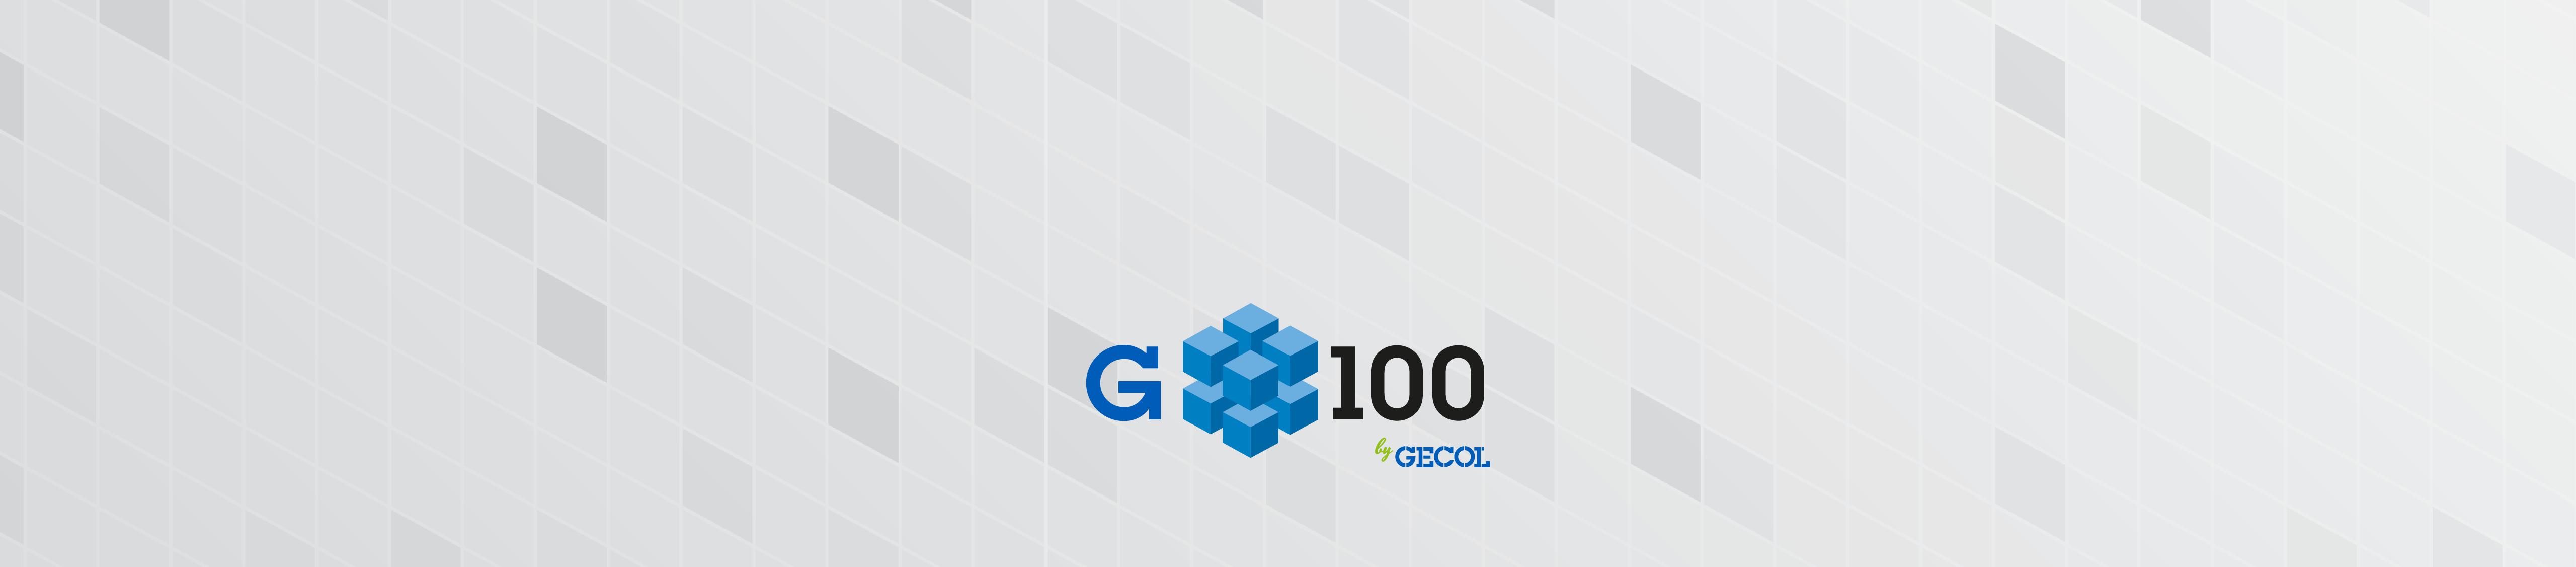 Nuovi Adesivi Gel G100 GECOL – Niente è impossibile!-